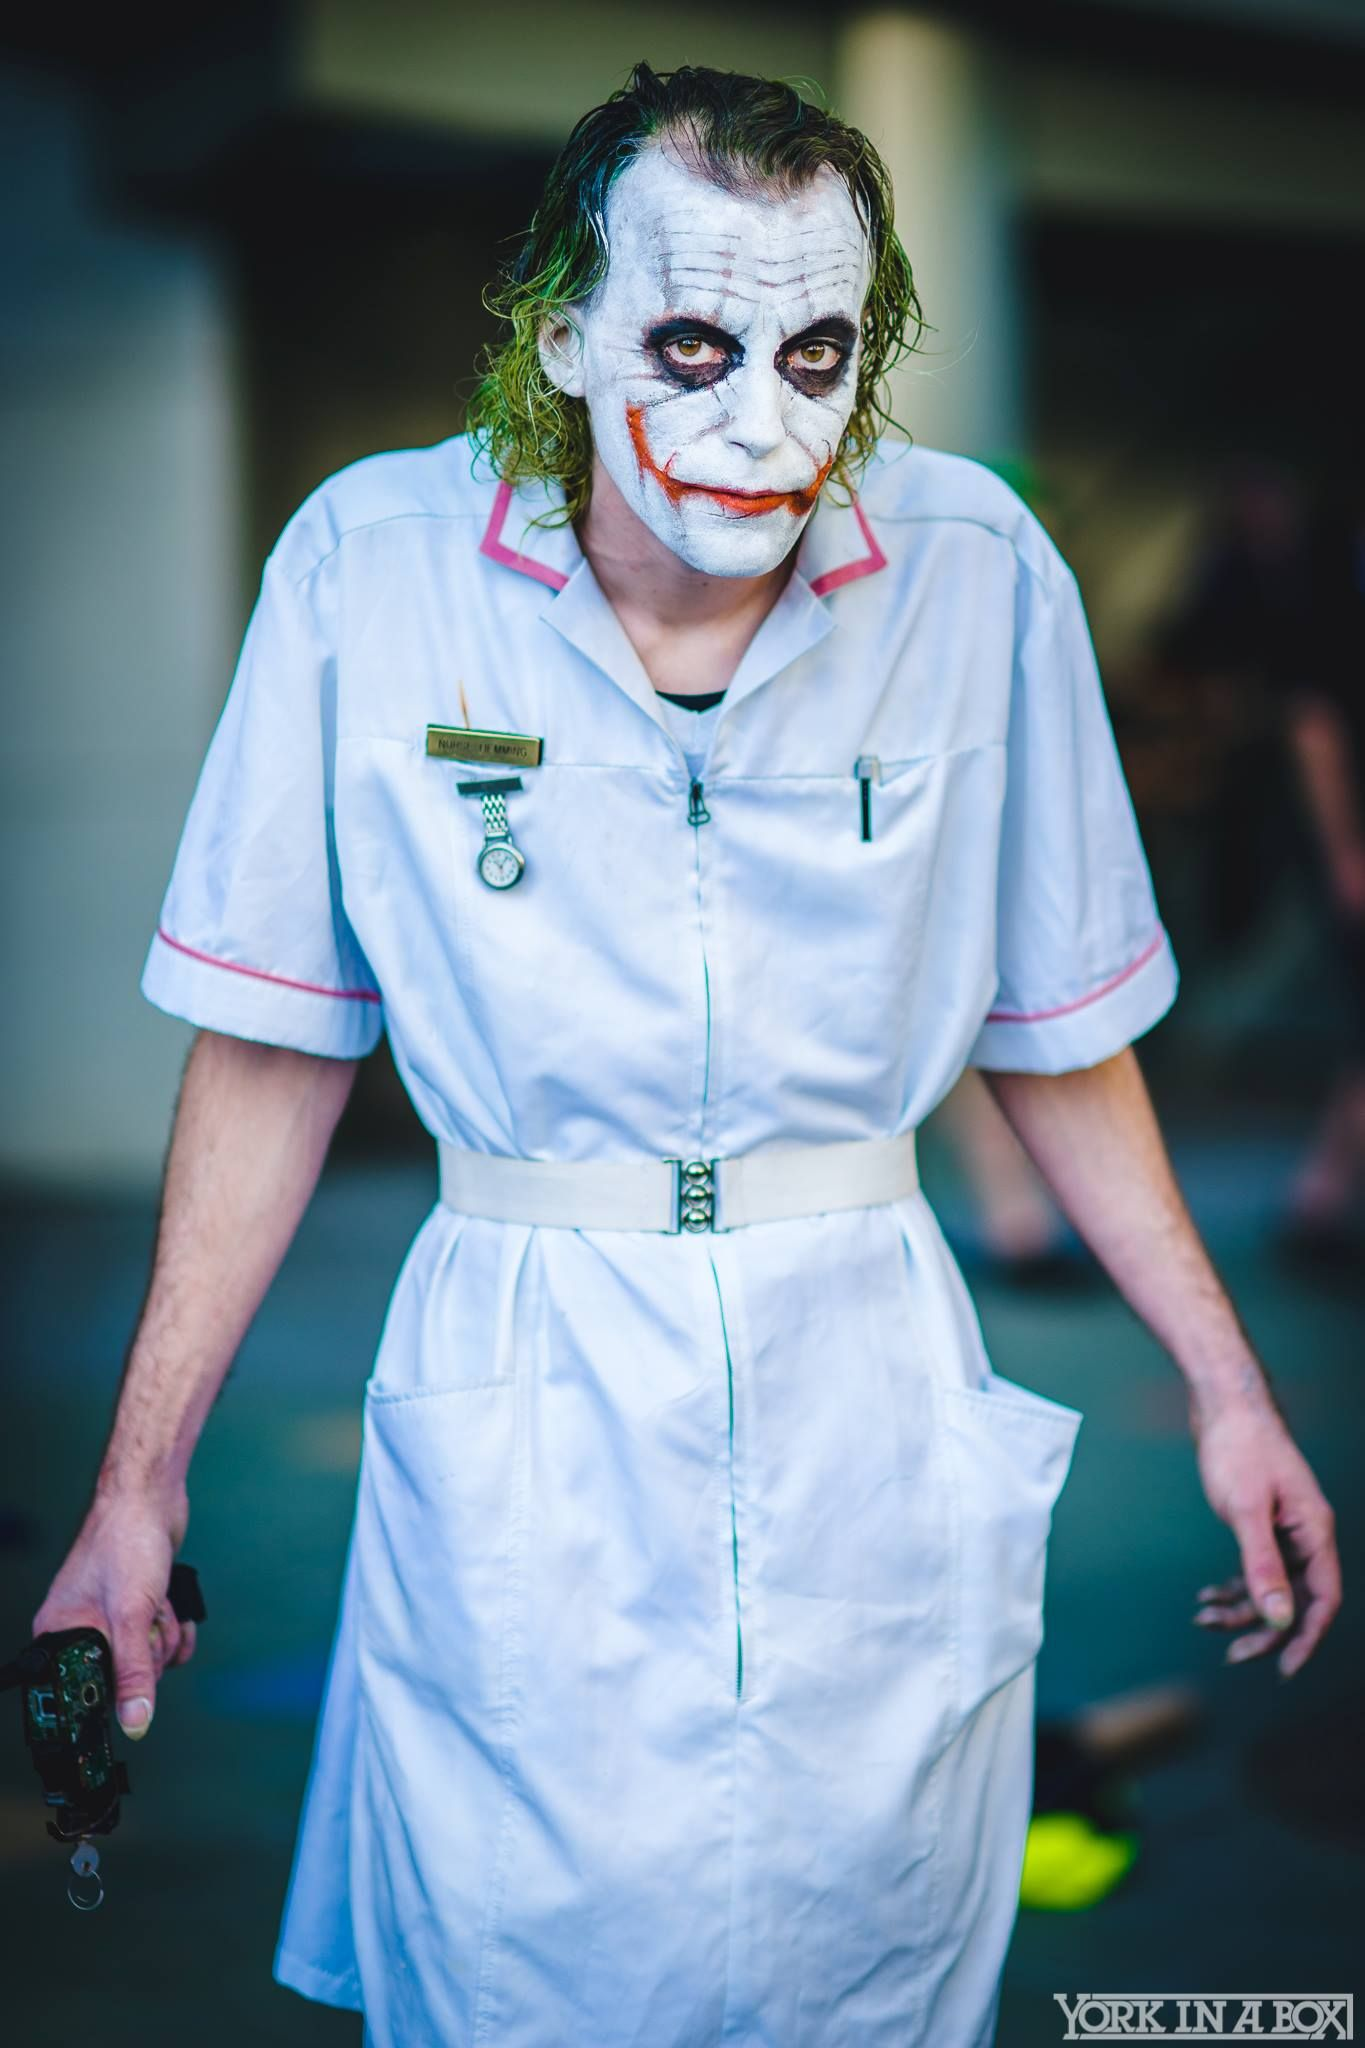 e17d7d12a3343 Nurse Joker by Joker & Harley- Agents of Chaos. — Photo by #YorkInABox  #Wondercon2015